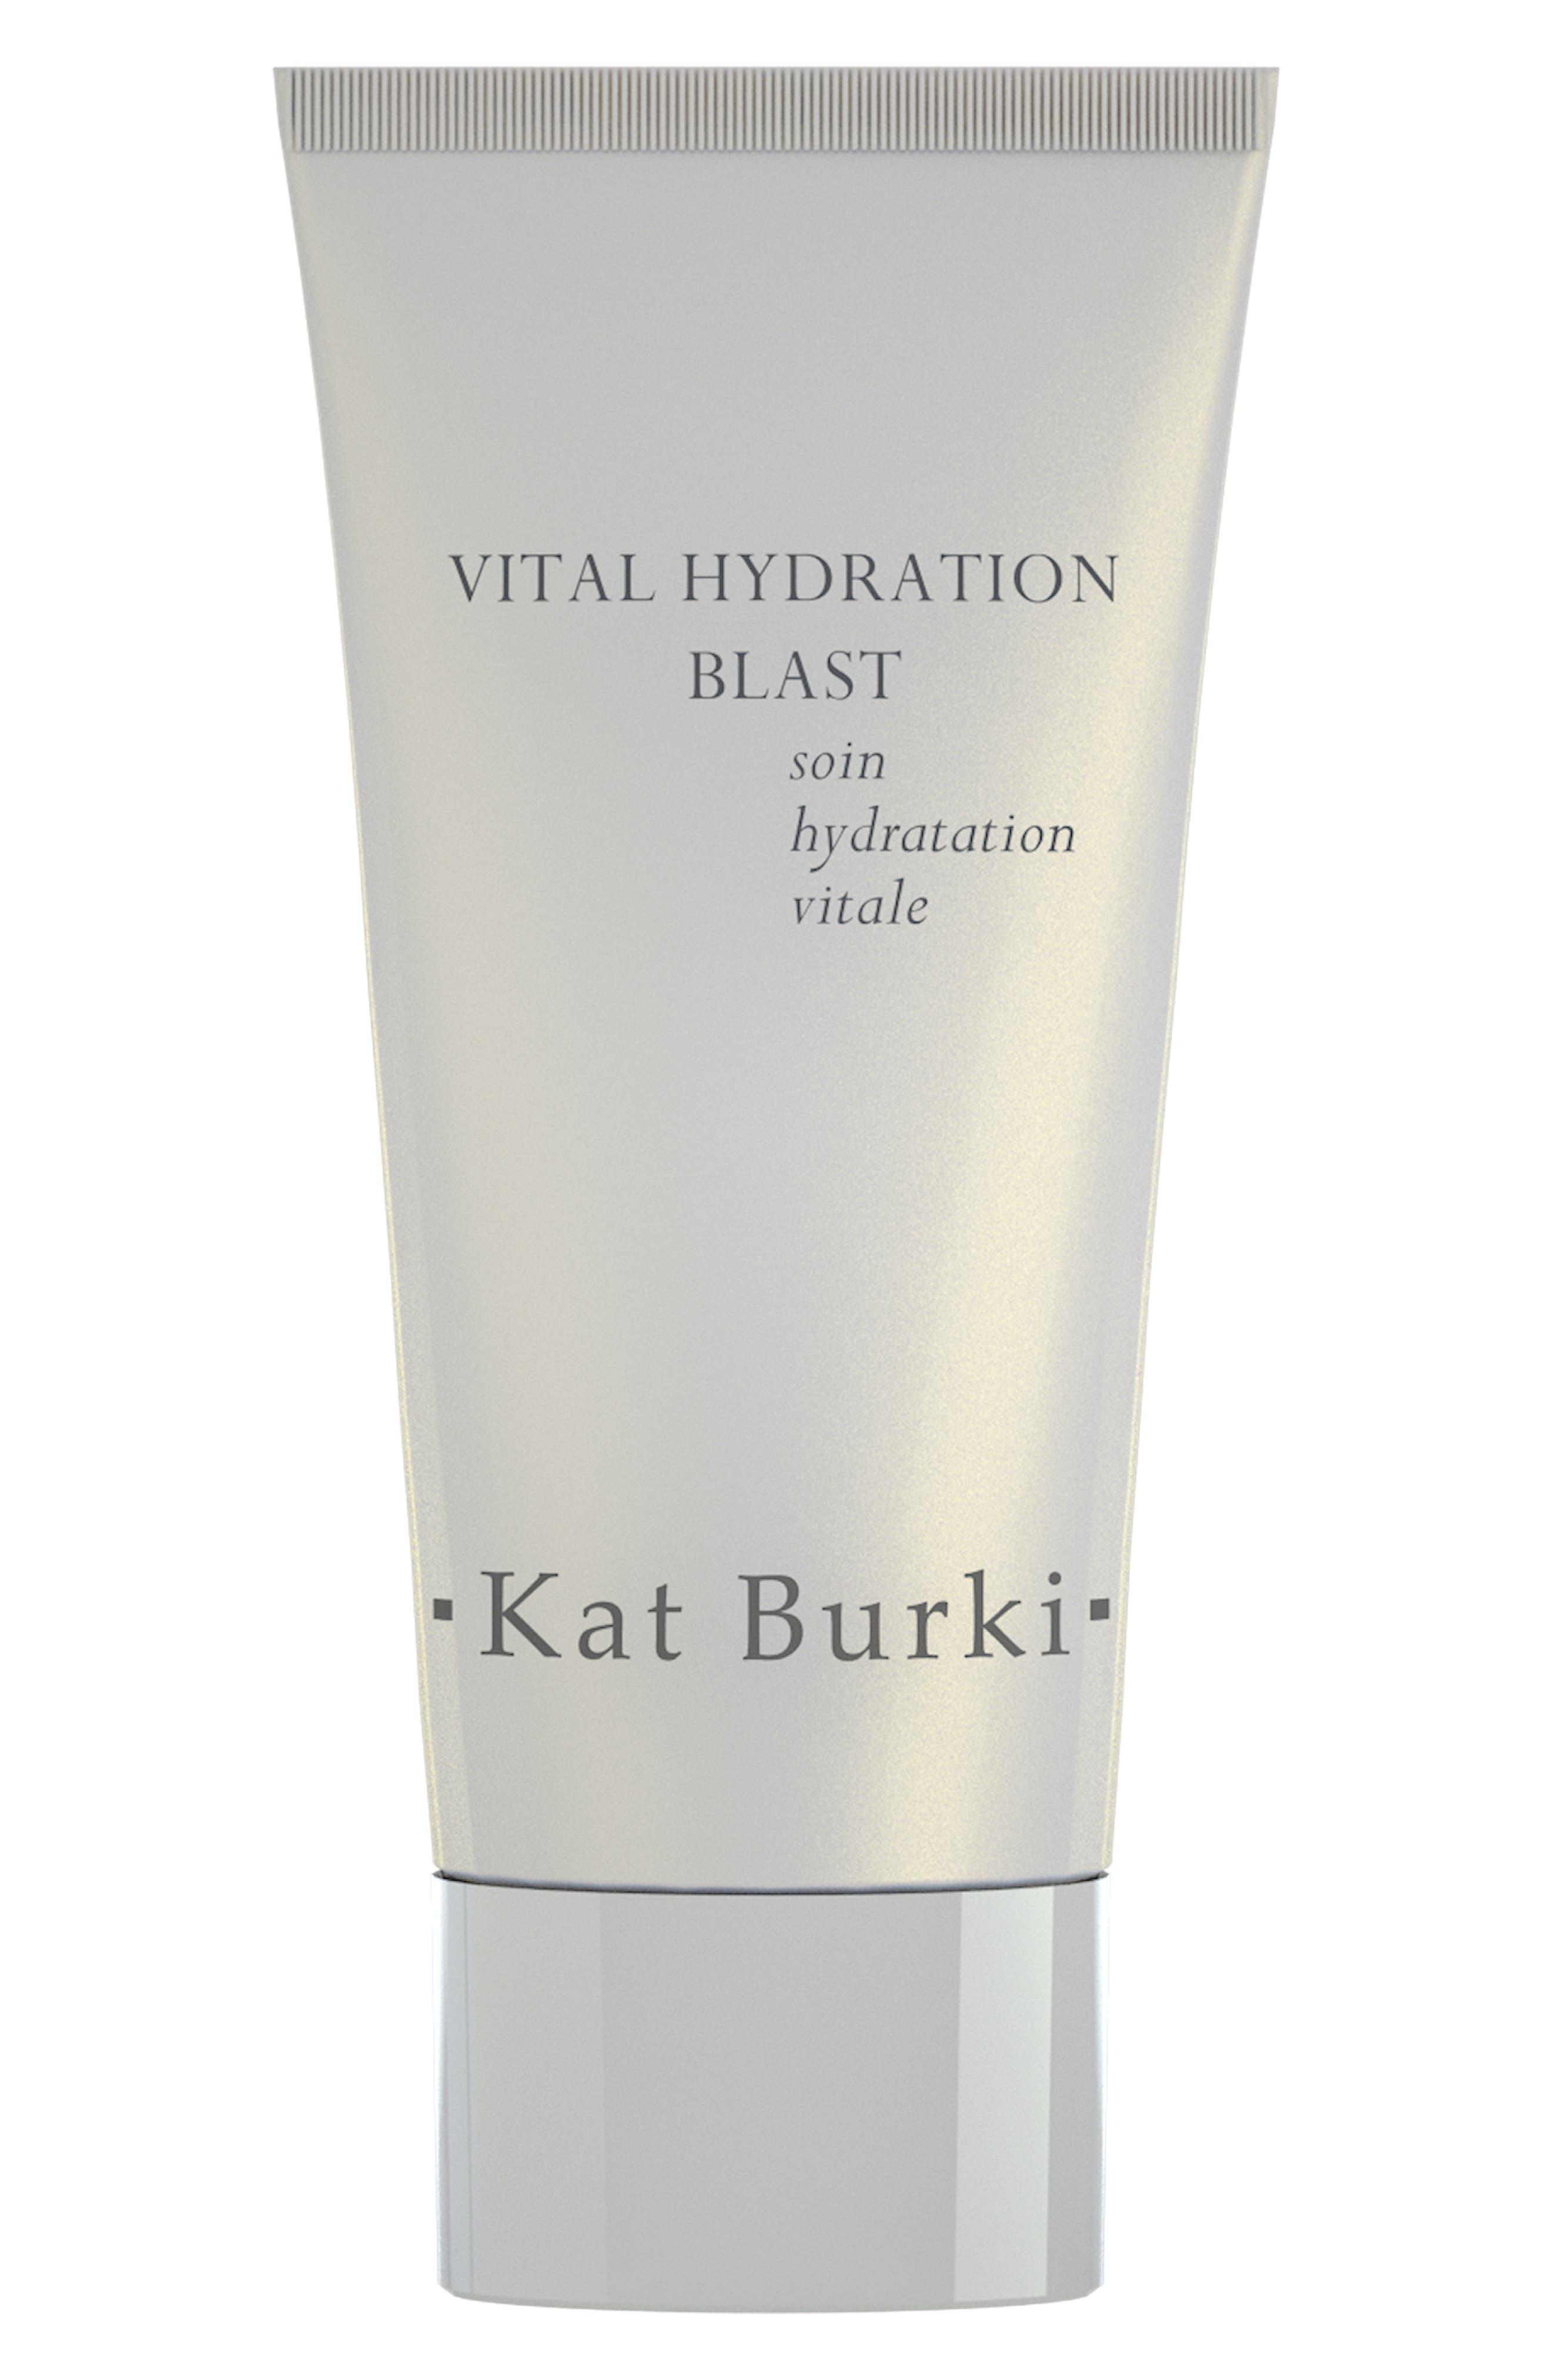 Vital Hydration Blast Face Mask